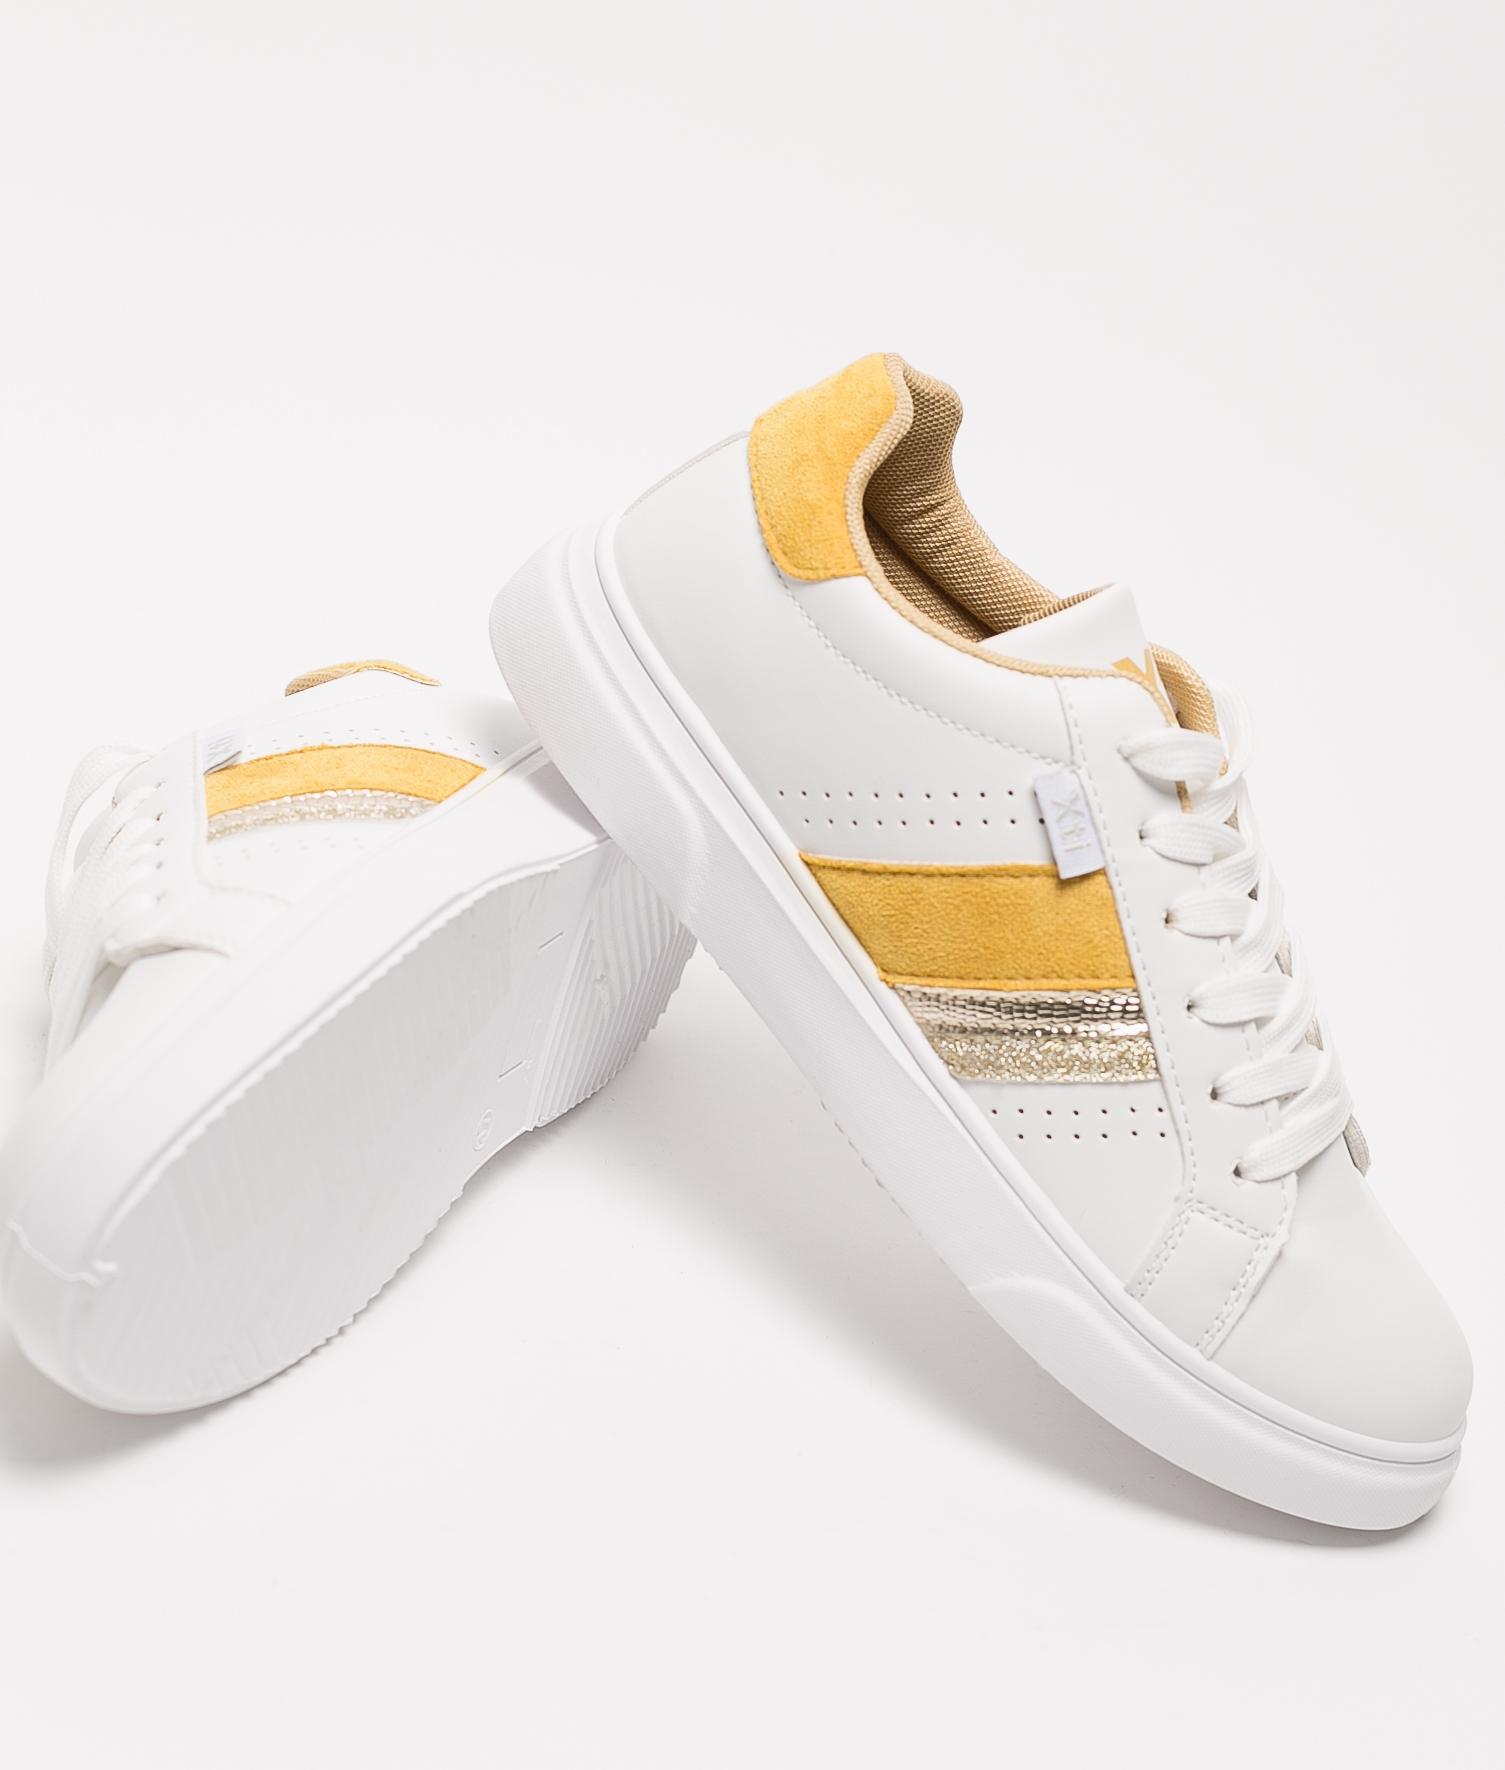 Sneakers Neus Xti- Jaune